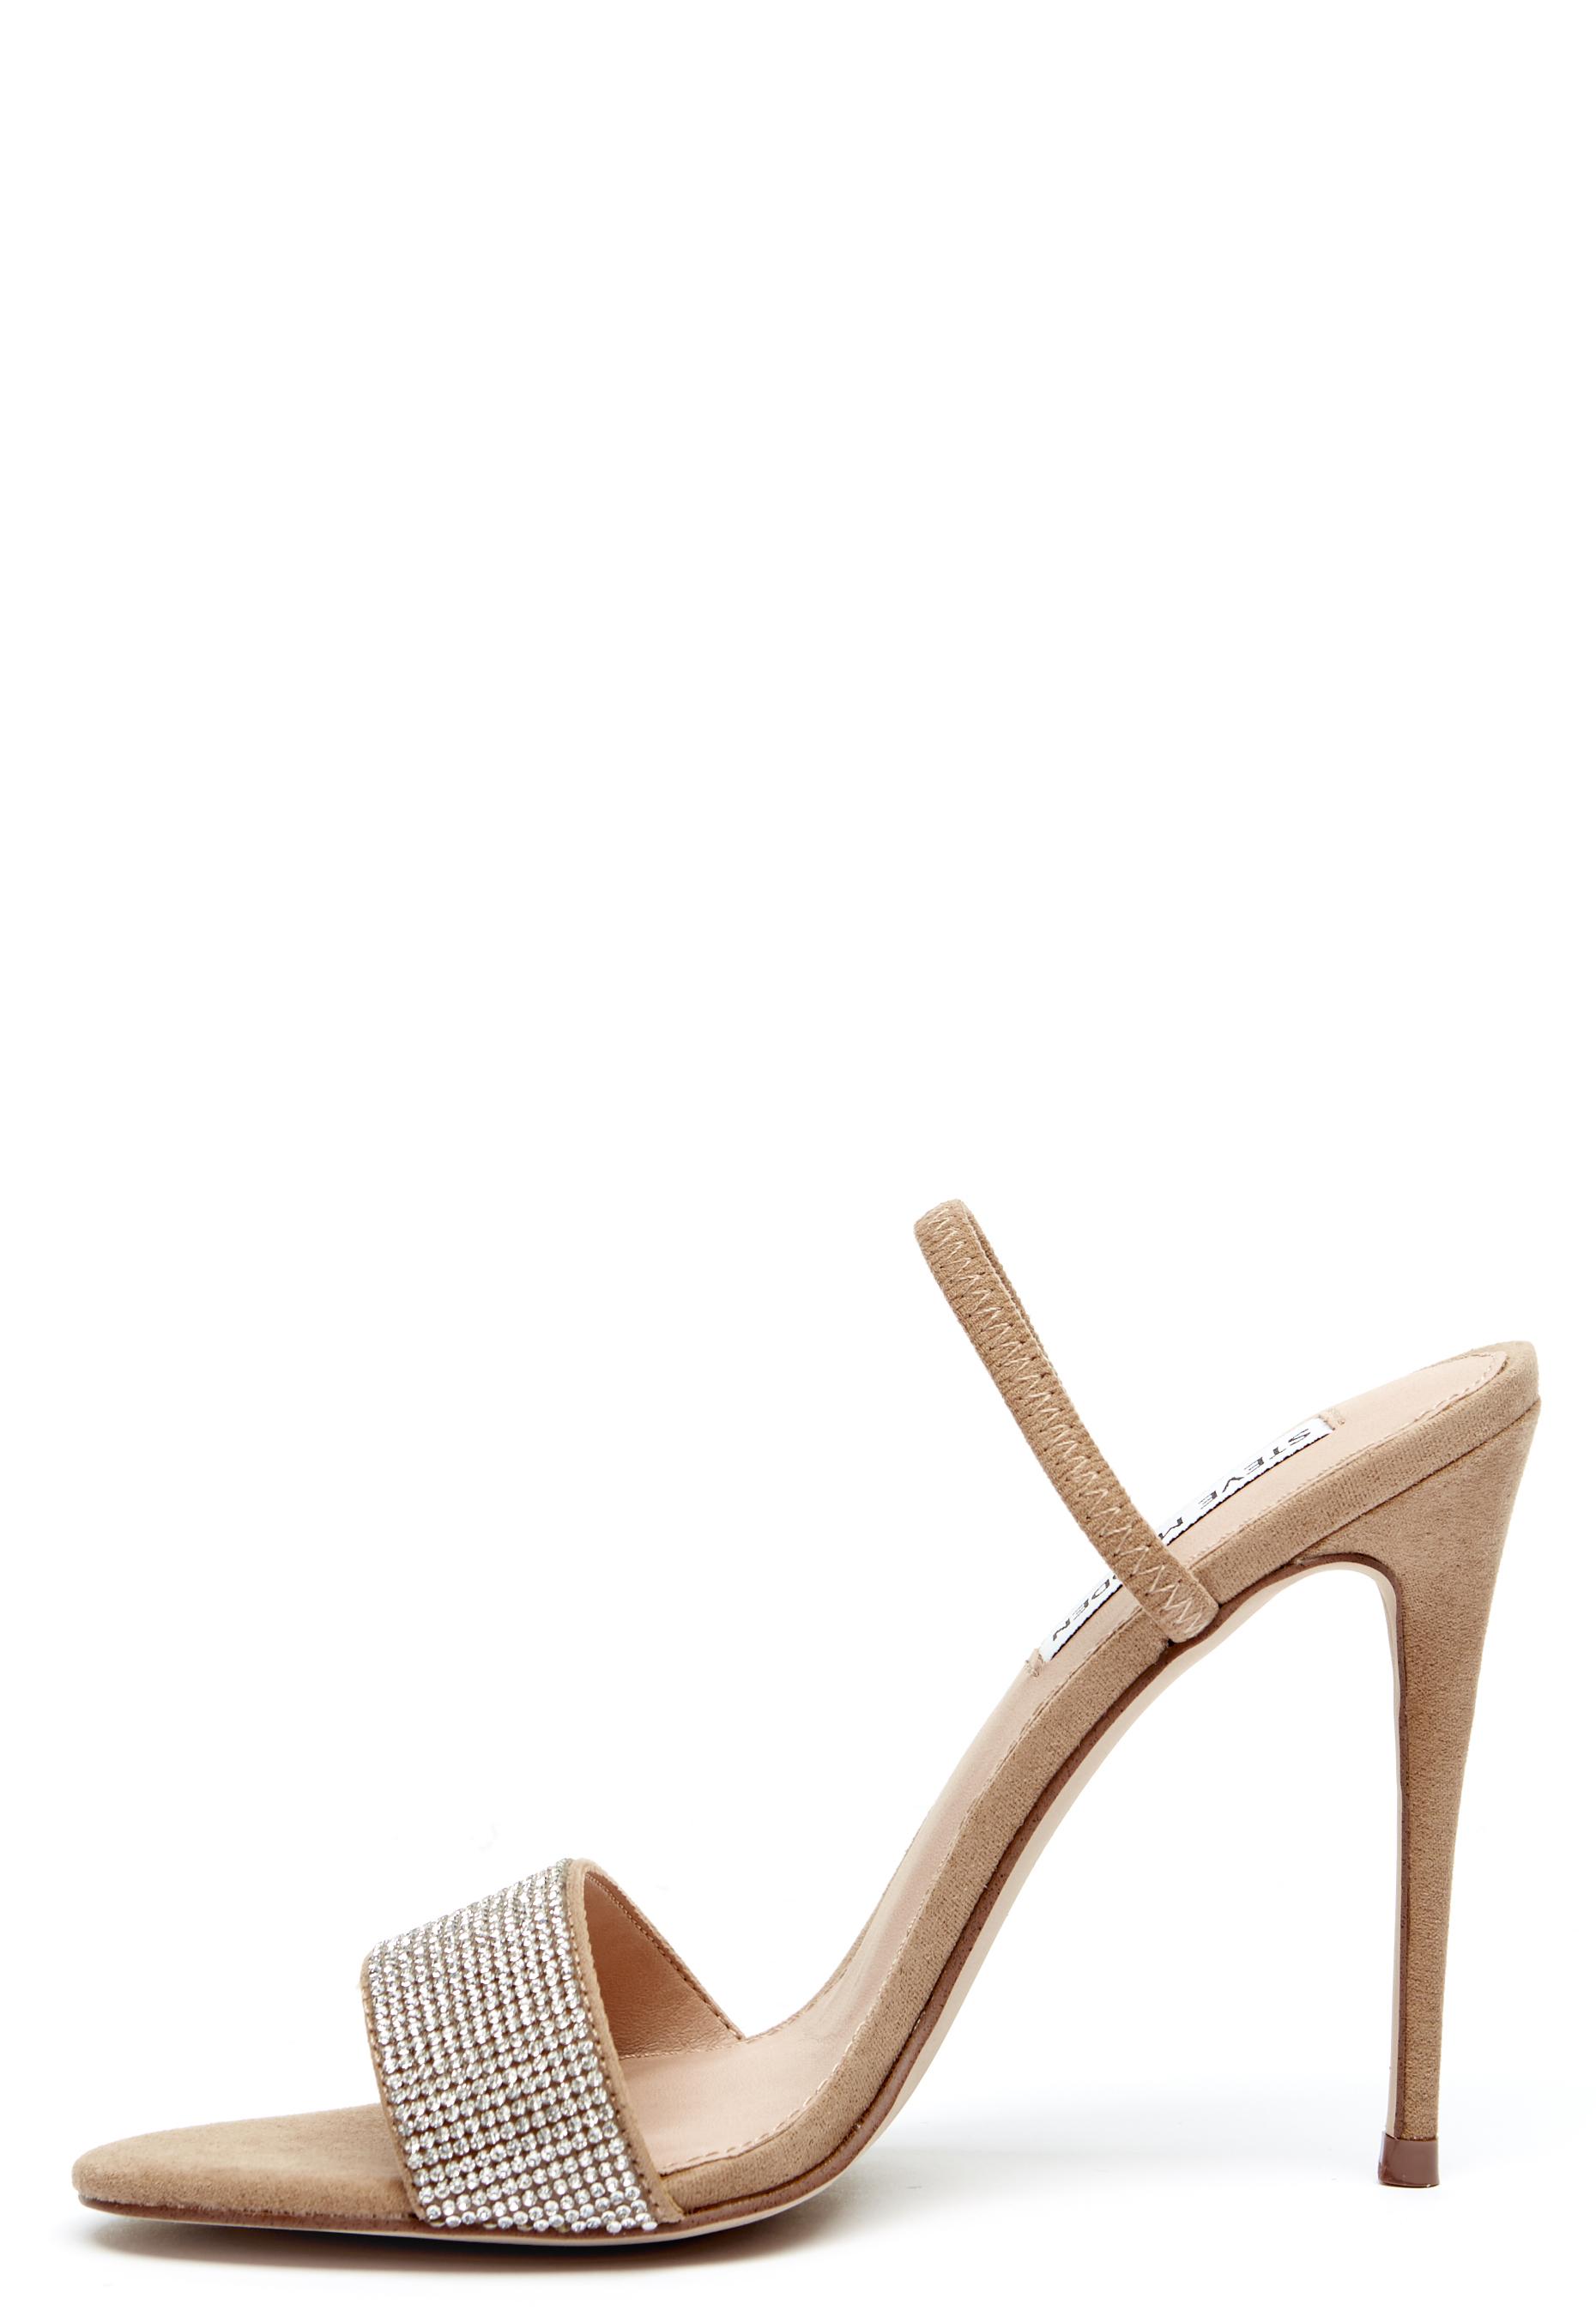 e481d92cdde Steve Madden Fierce High Heel Sandal Rhinestones - Bubbleroom